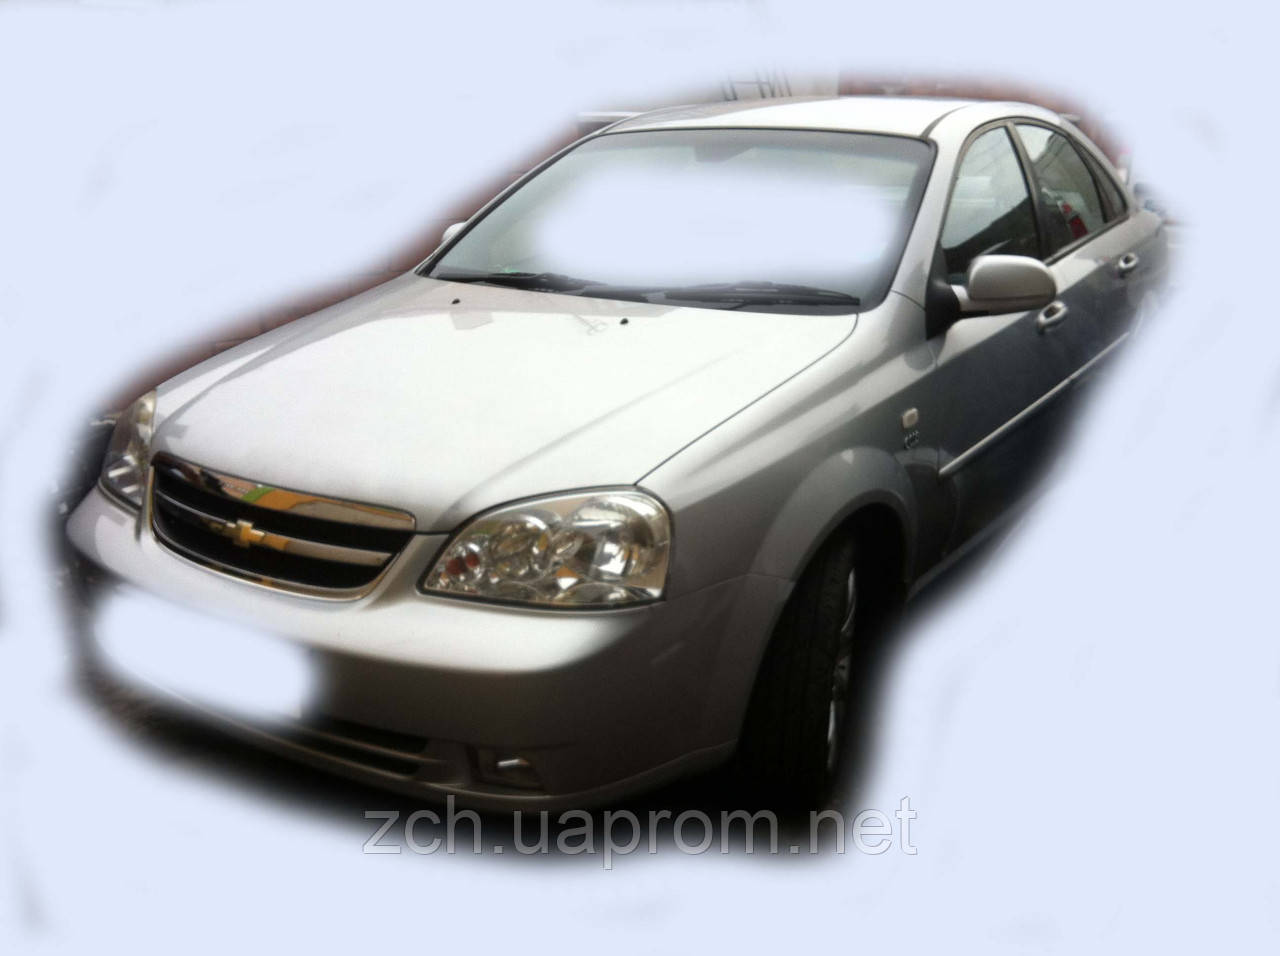 Дачик удара Chevrolet Lachetti